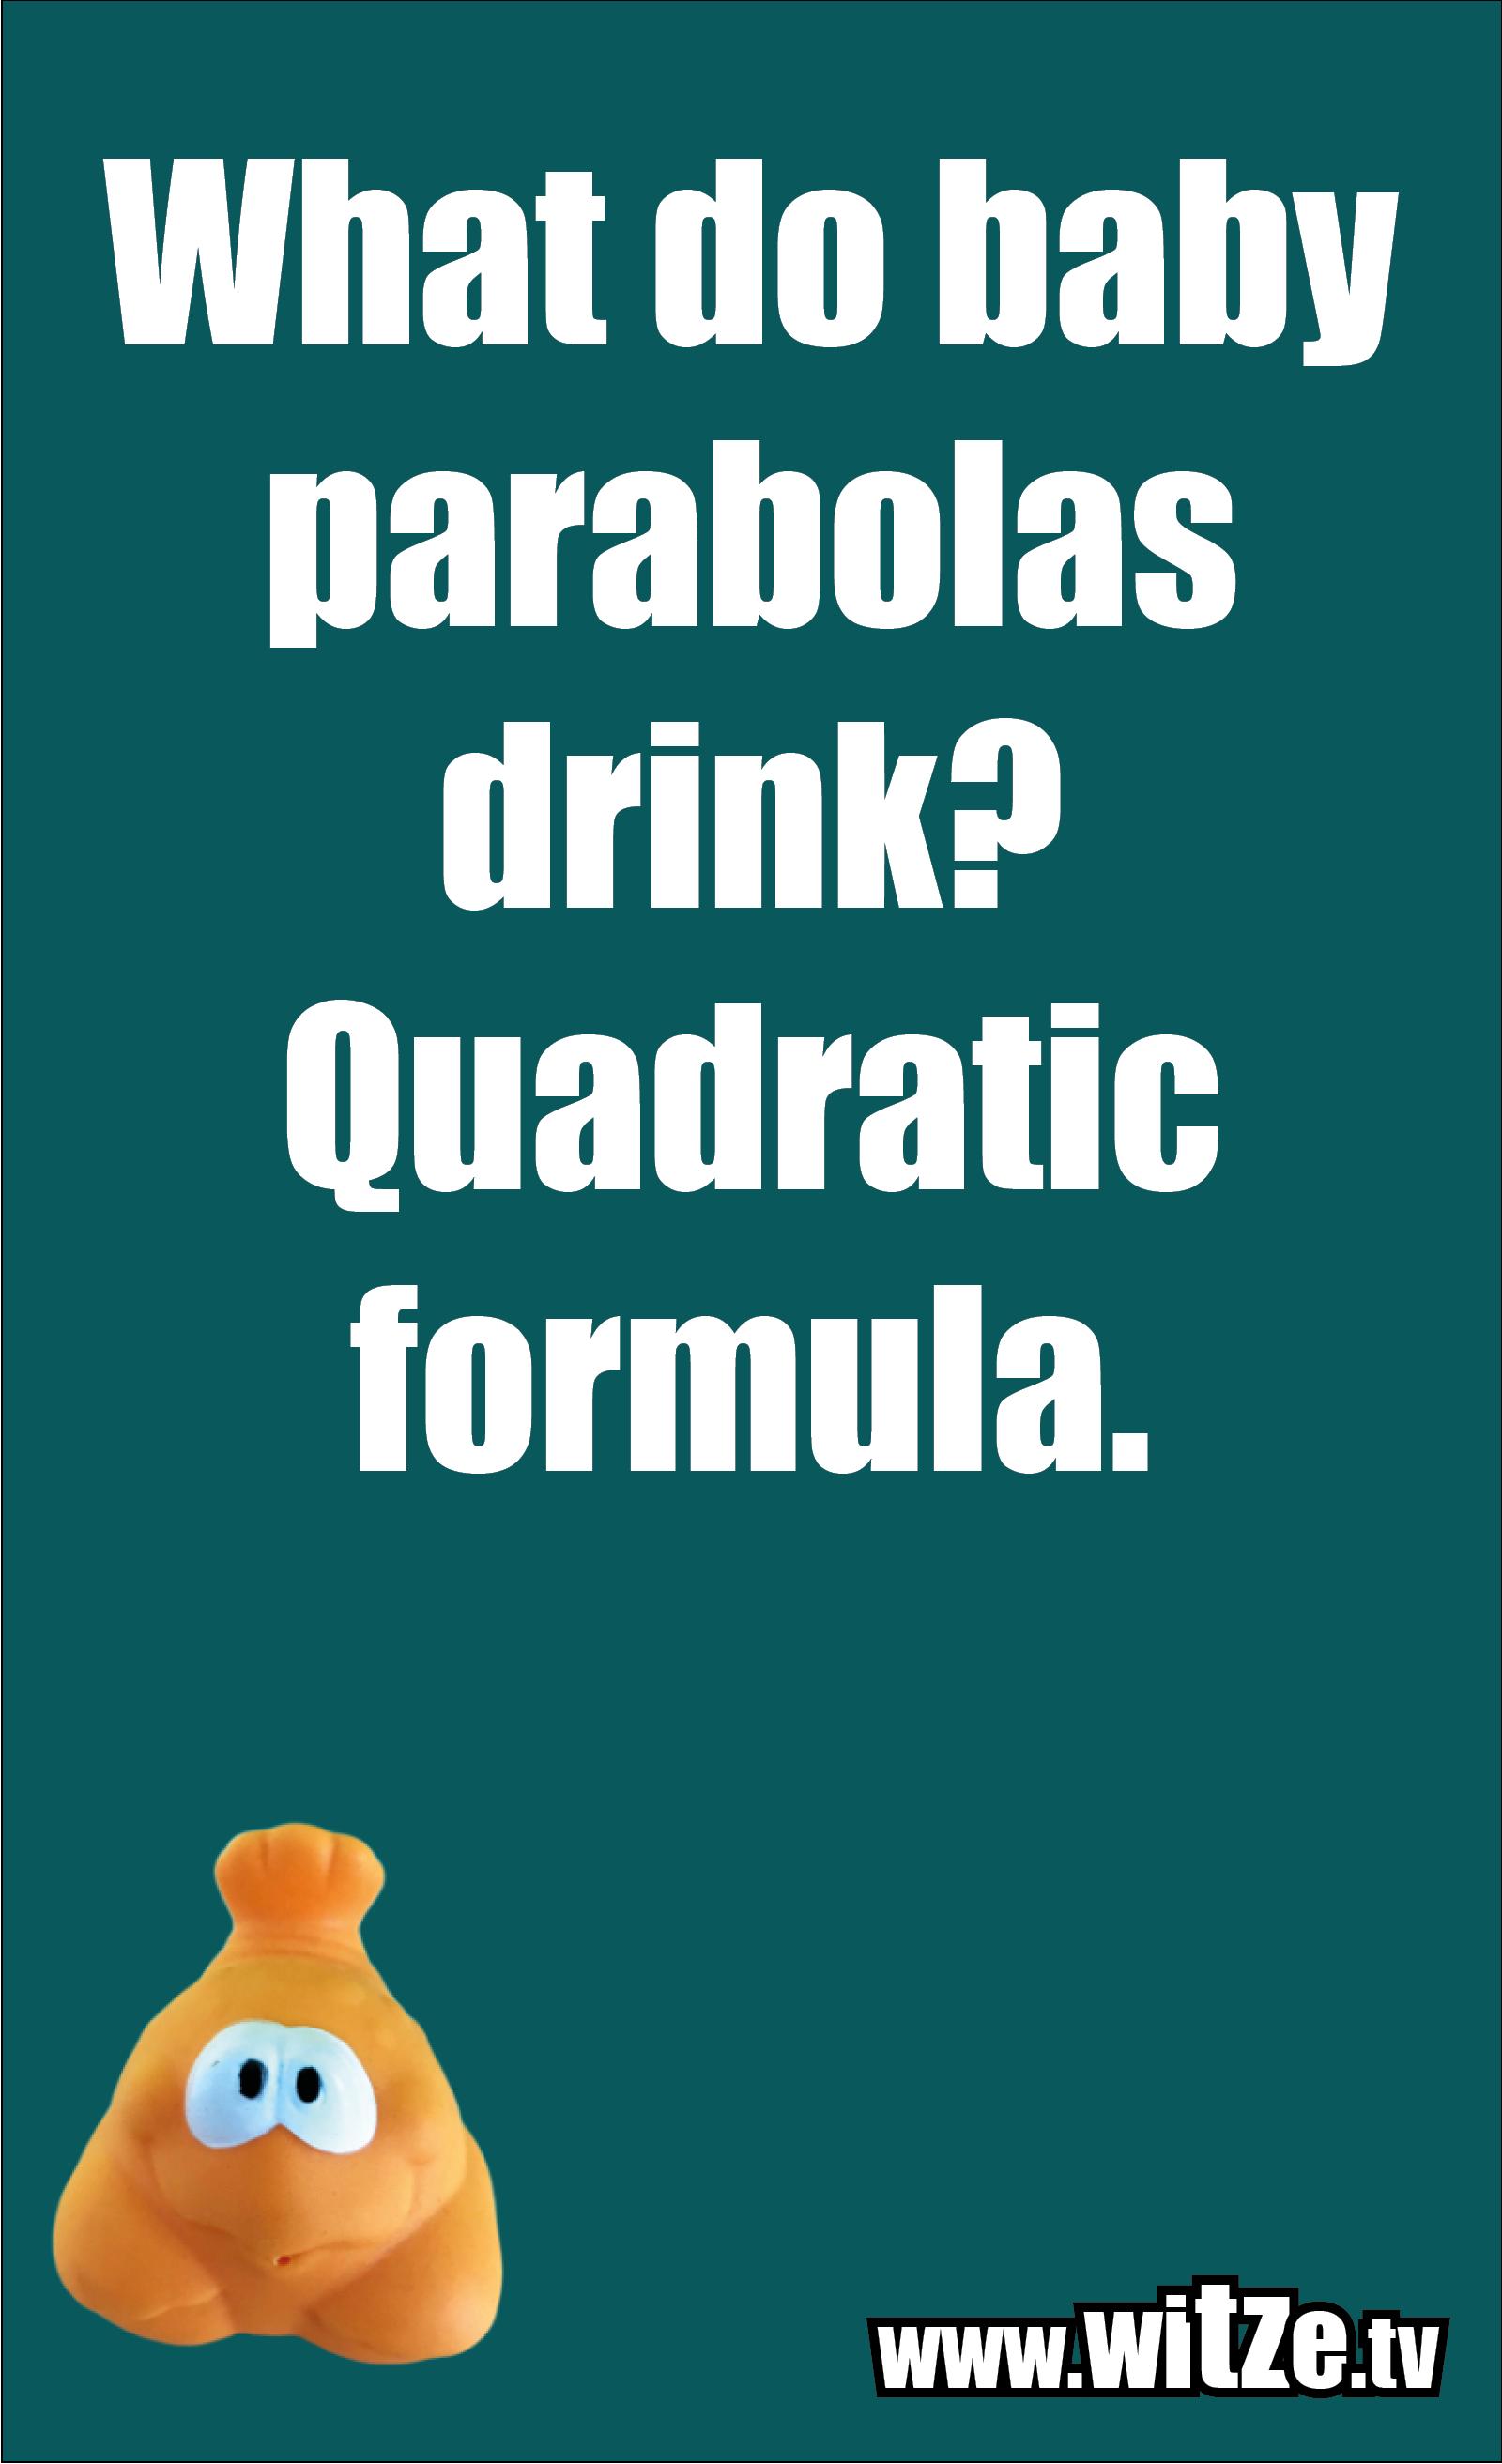 Math joke… What do baby parabolas drink? Quadratic formula.